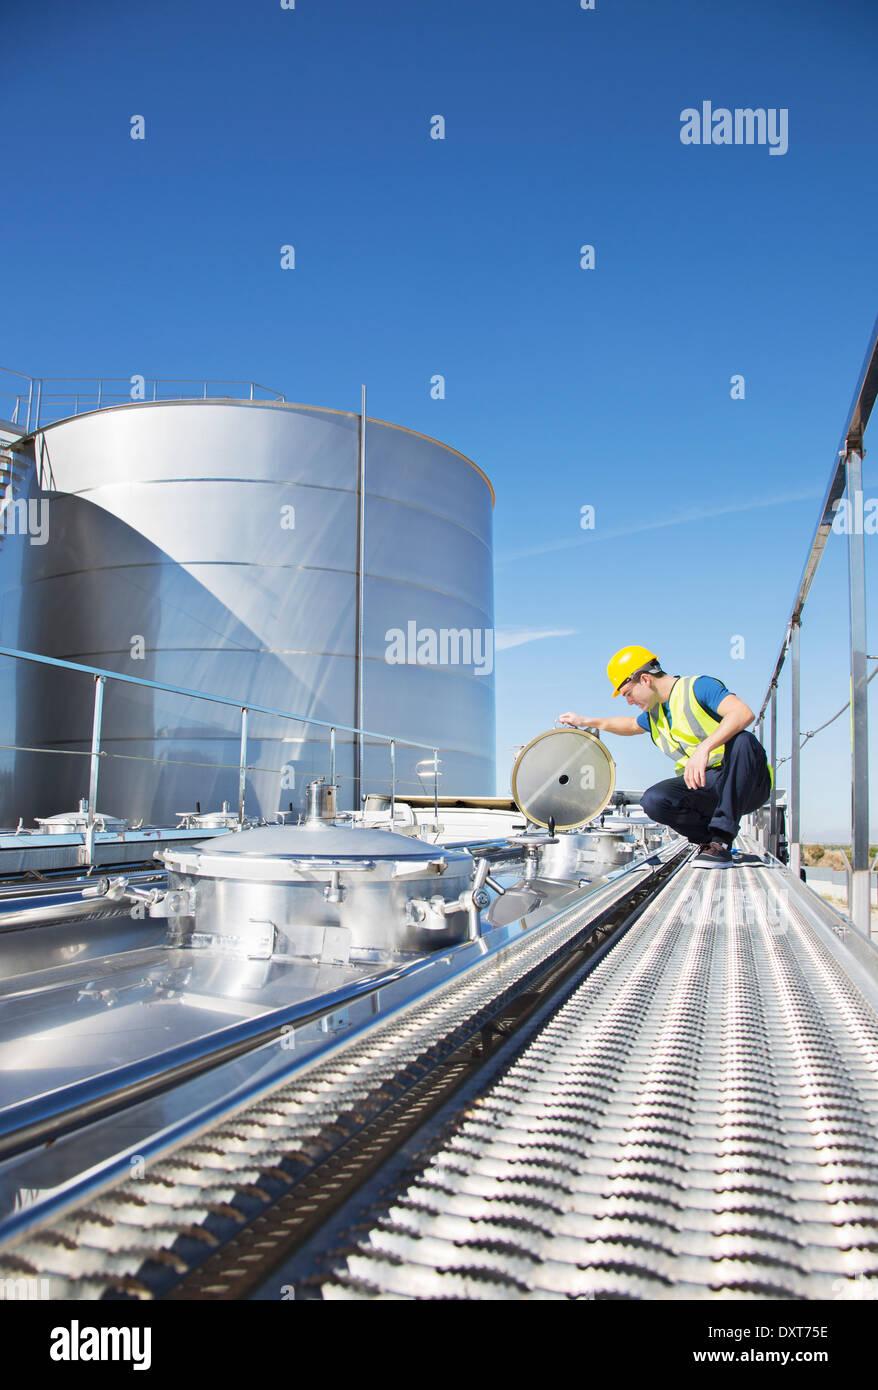 Worker on platform above stainless steel milk tanker Stock Photo